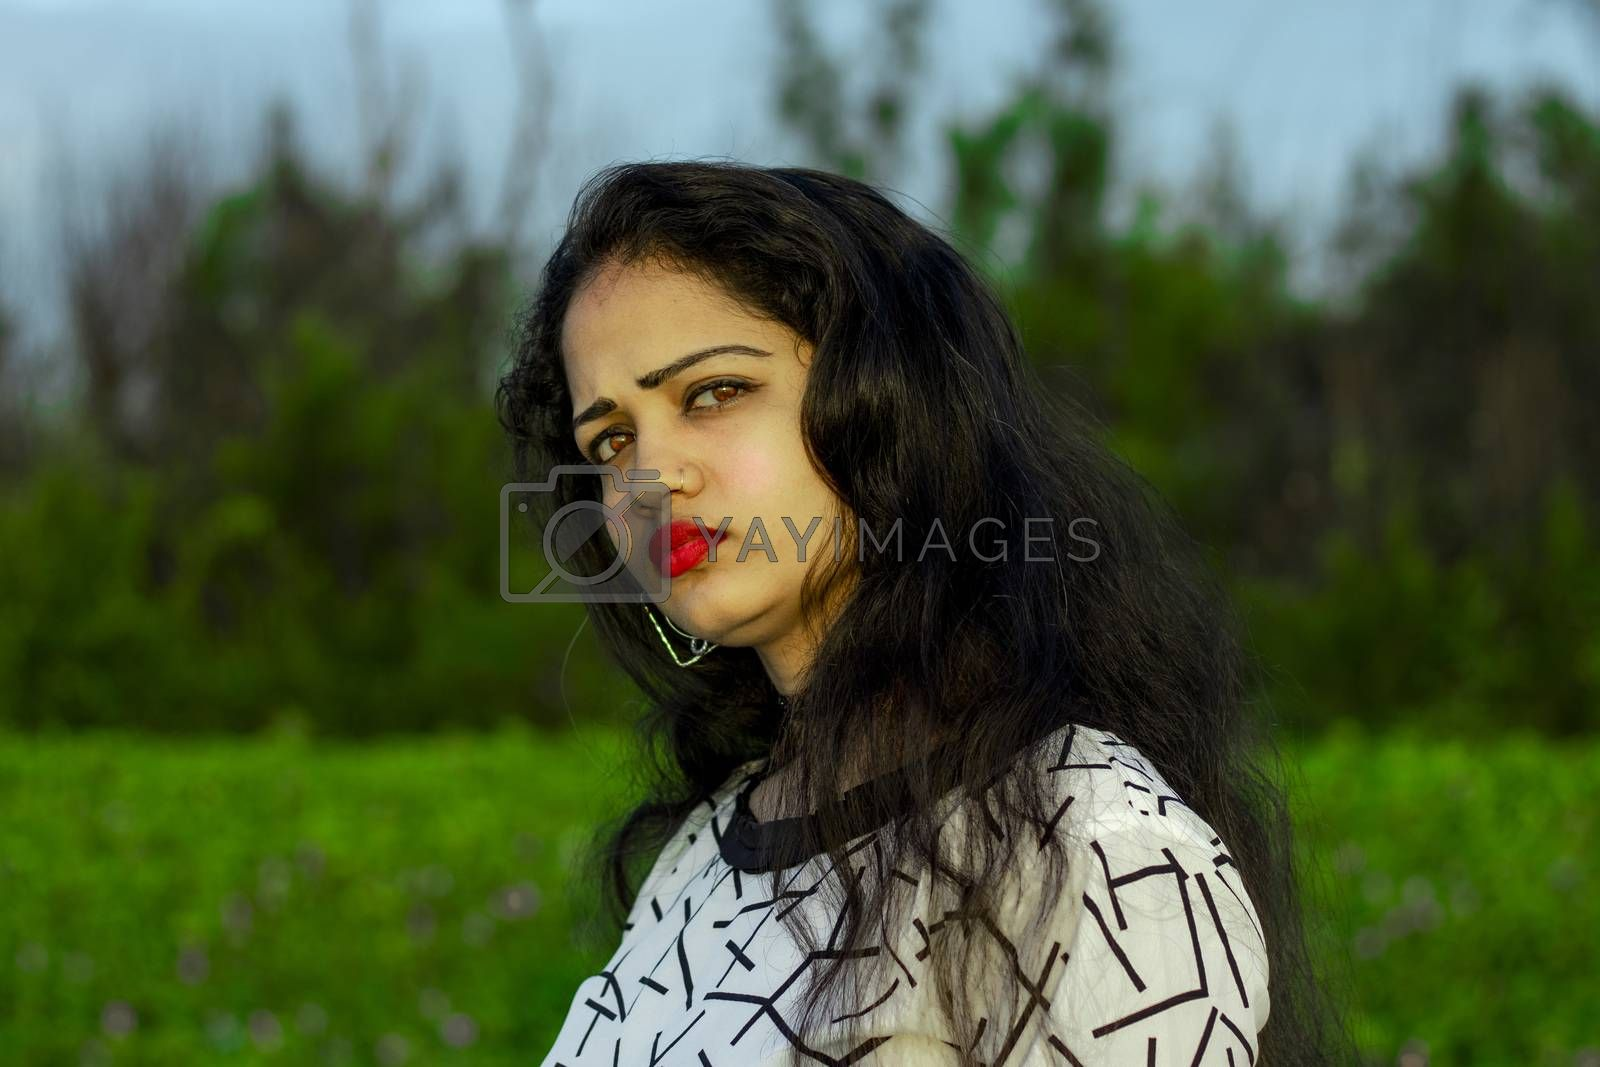 beautiful female model face beauty outdoors portrait